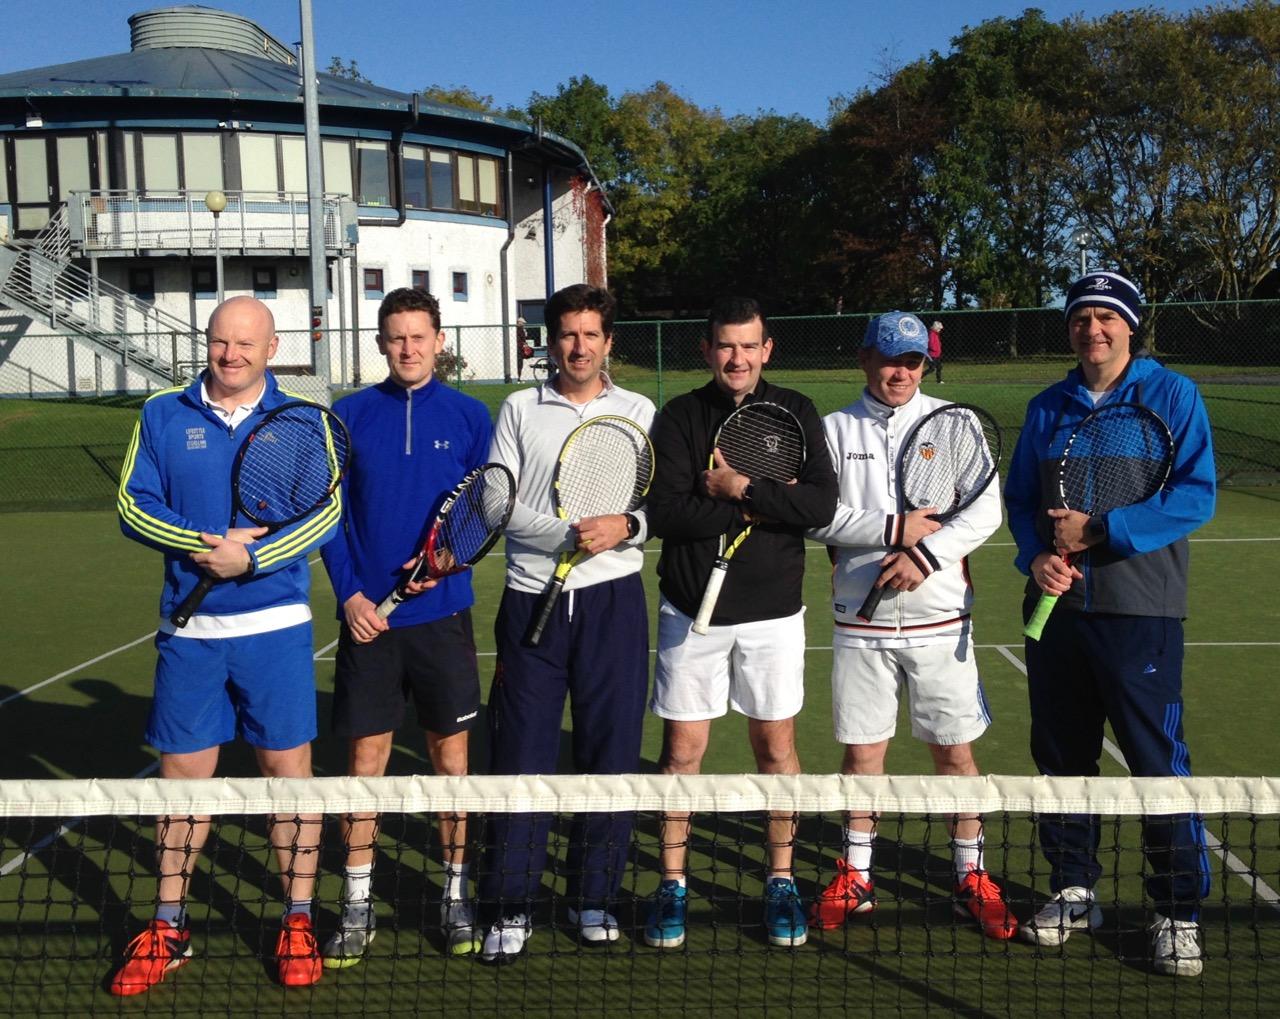 About Us - Greystones Tennis Club